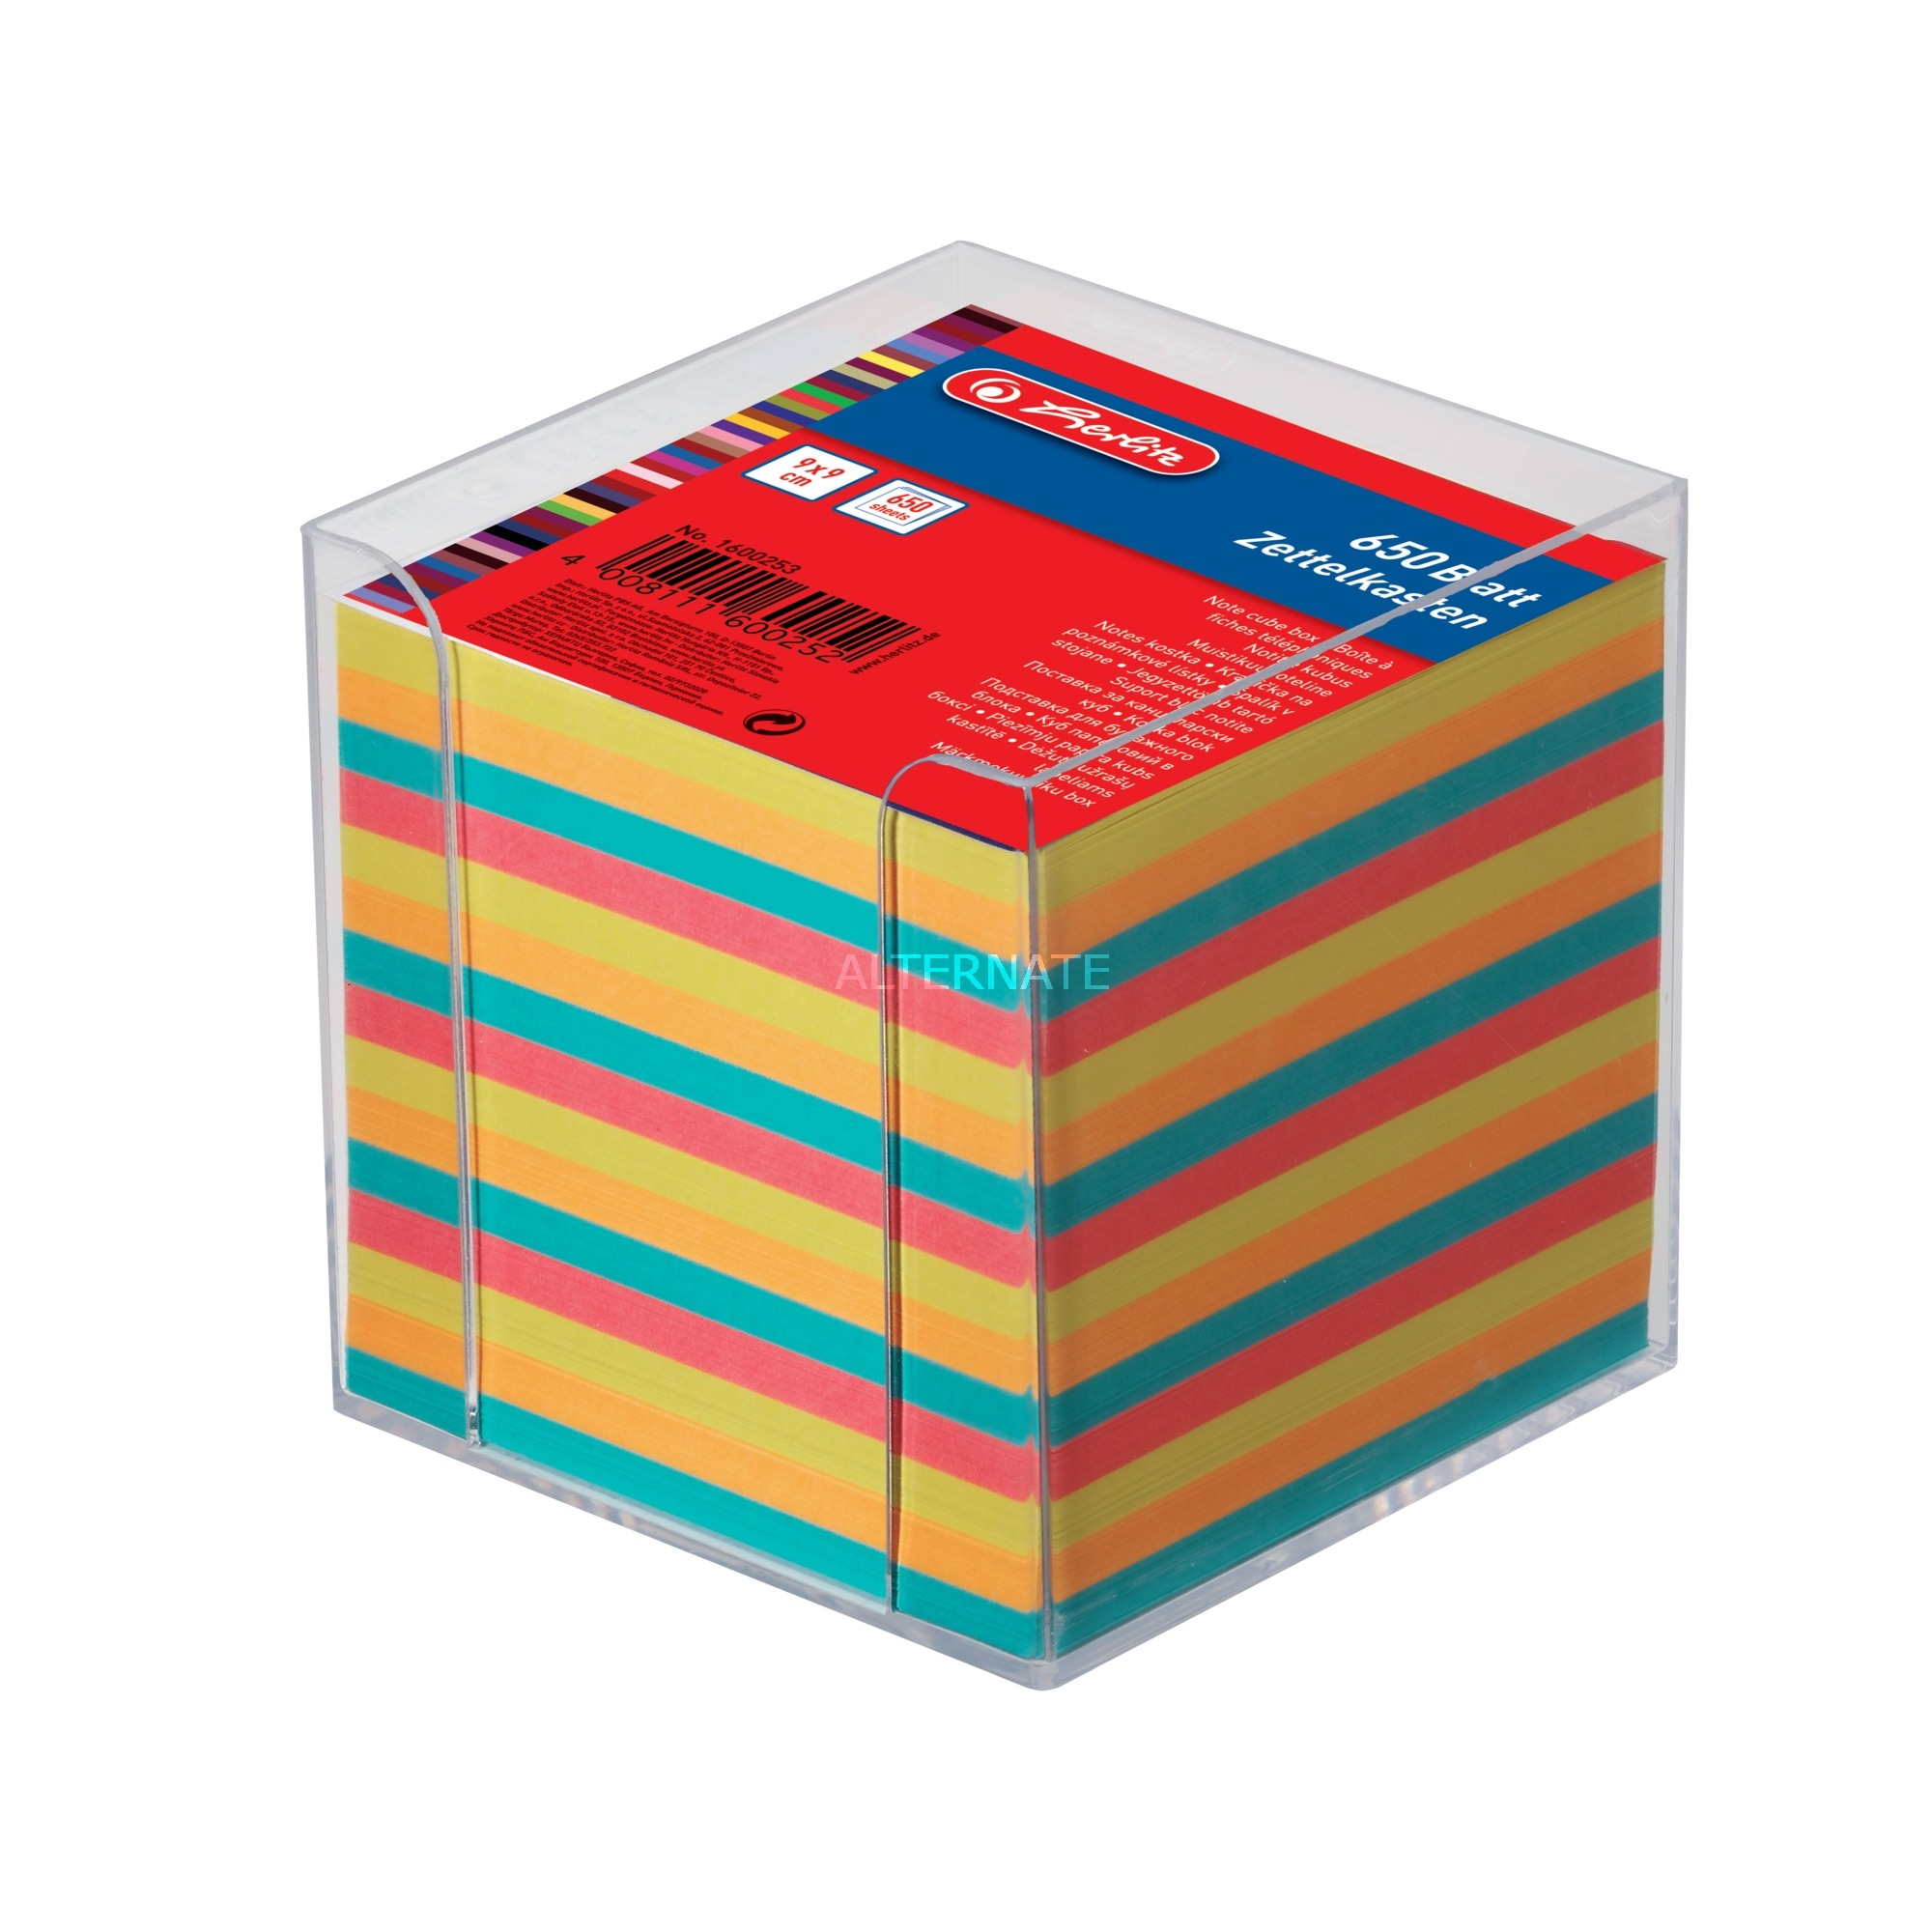 01600253 nota autoadhesiva Plaza Multicolor, Organizador